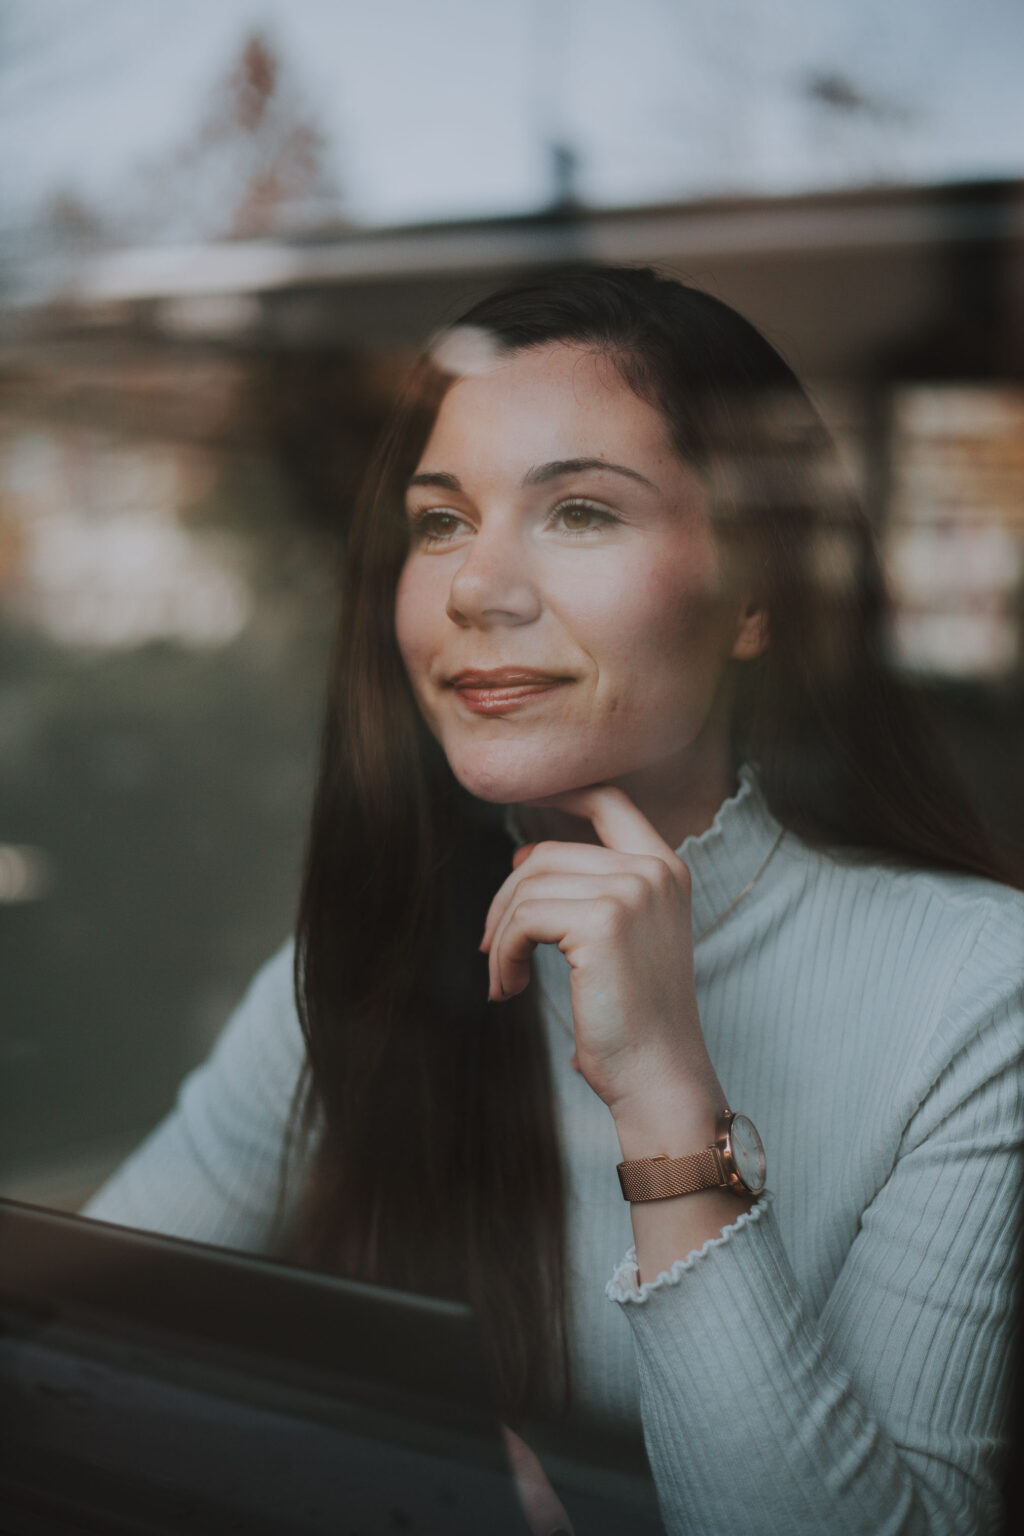 Portraits of Sara Peranic